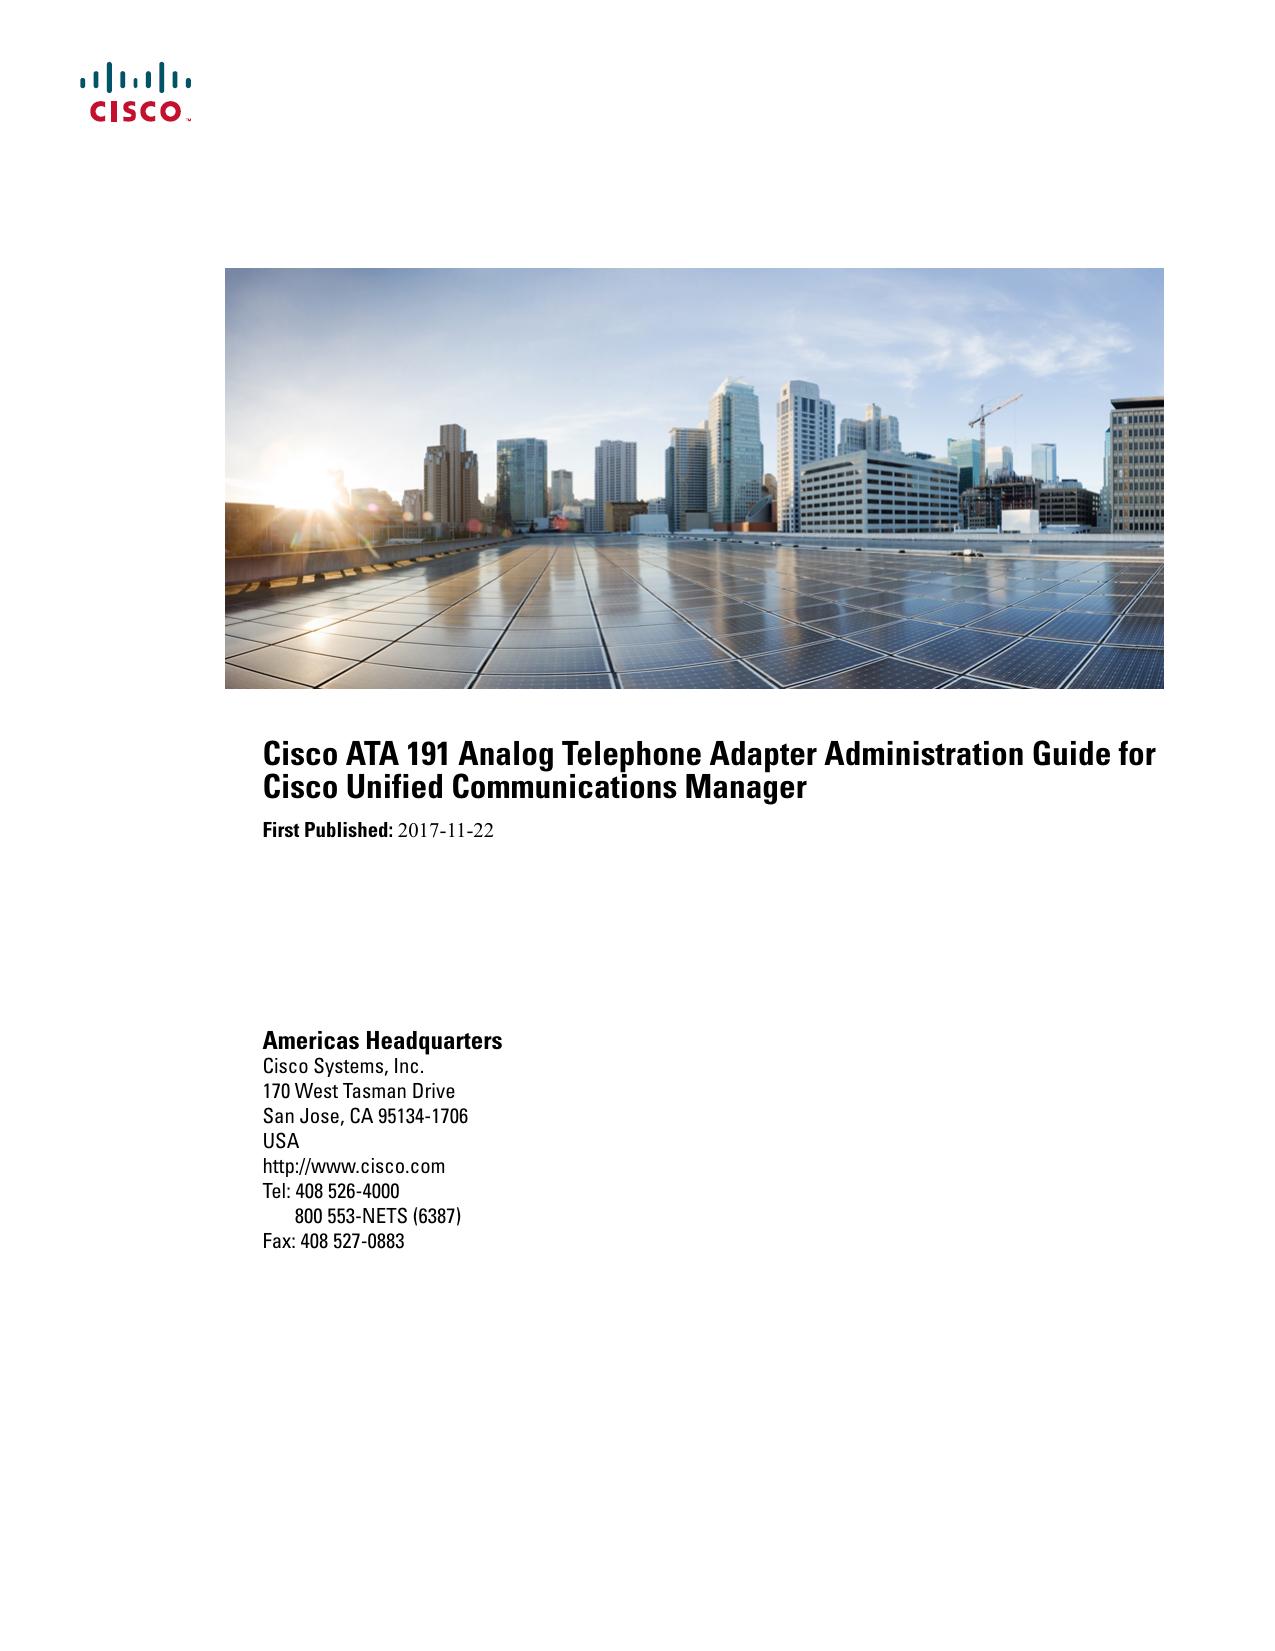 Cisco ATA 191 Analog Telephone Adapter Administration Guide